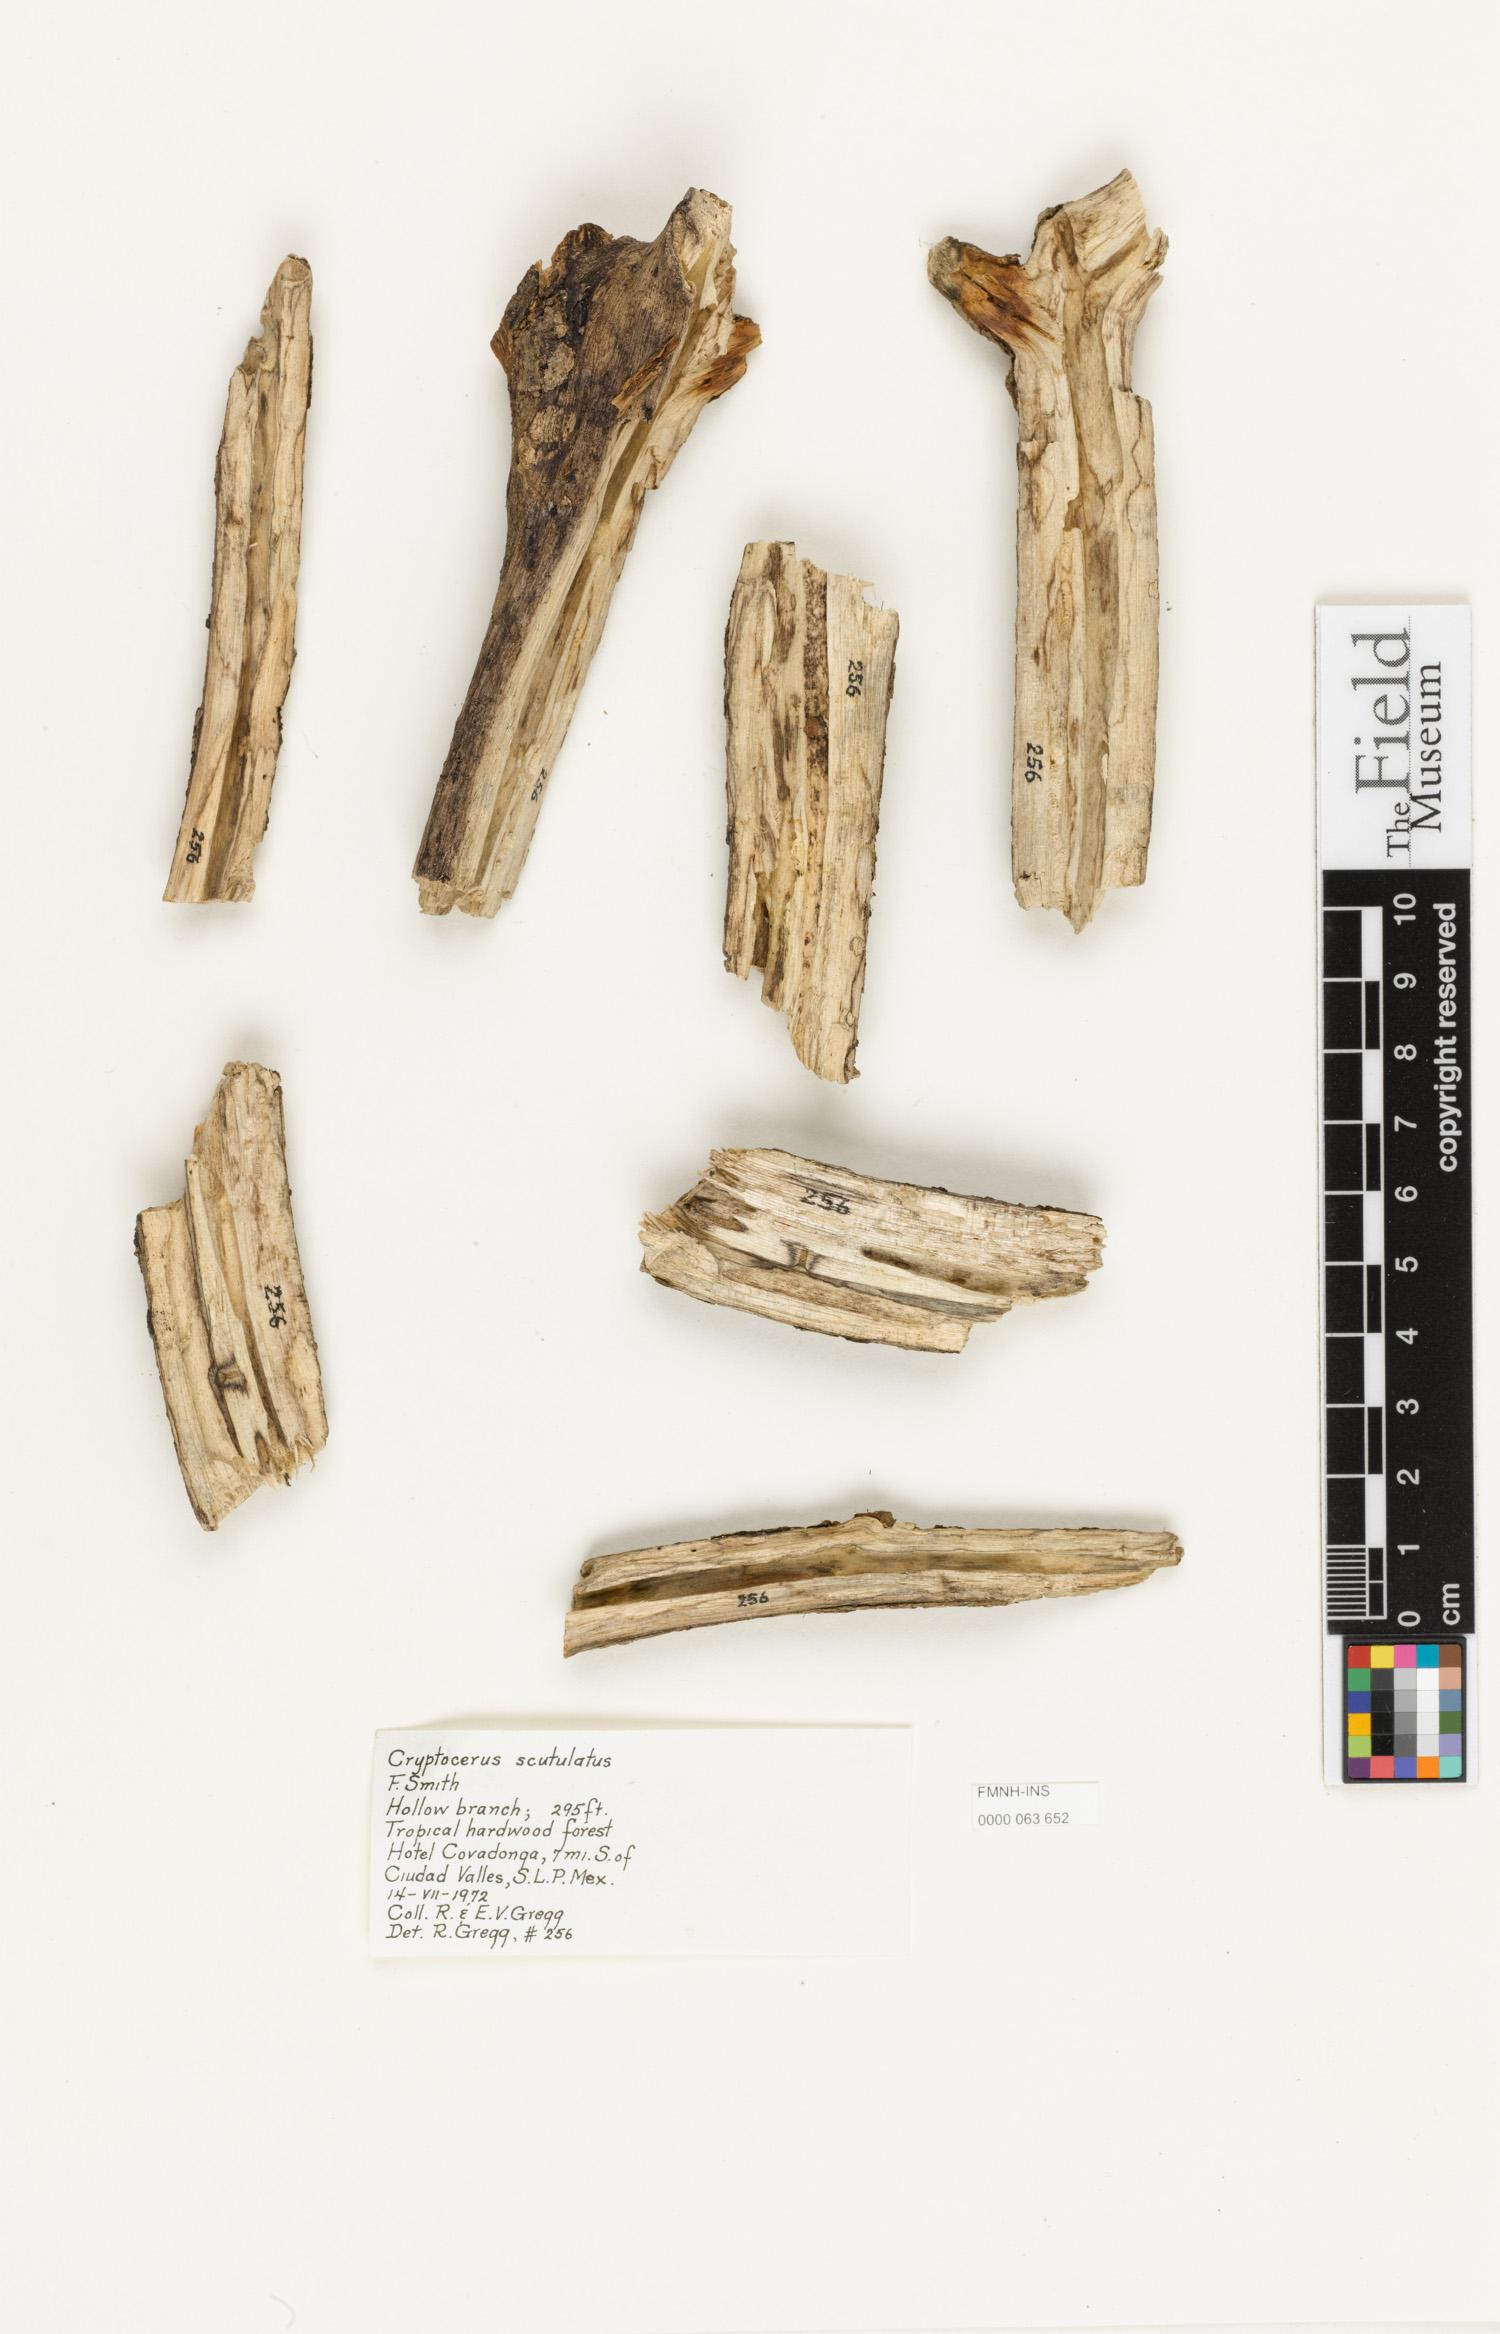 Image of Cephalotes scutulatus